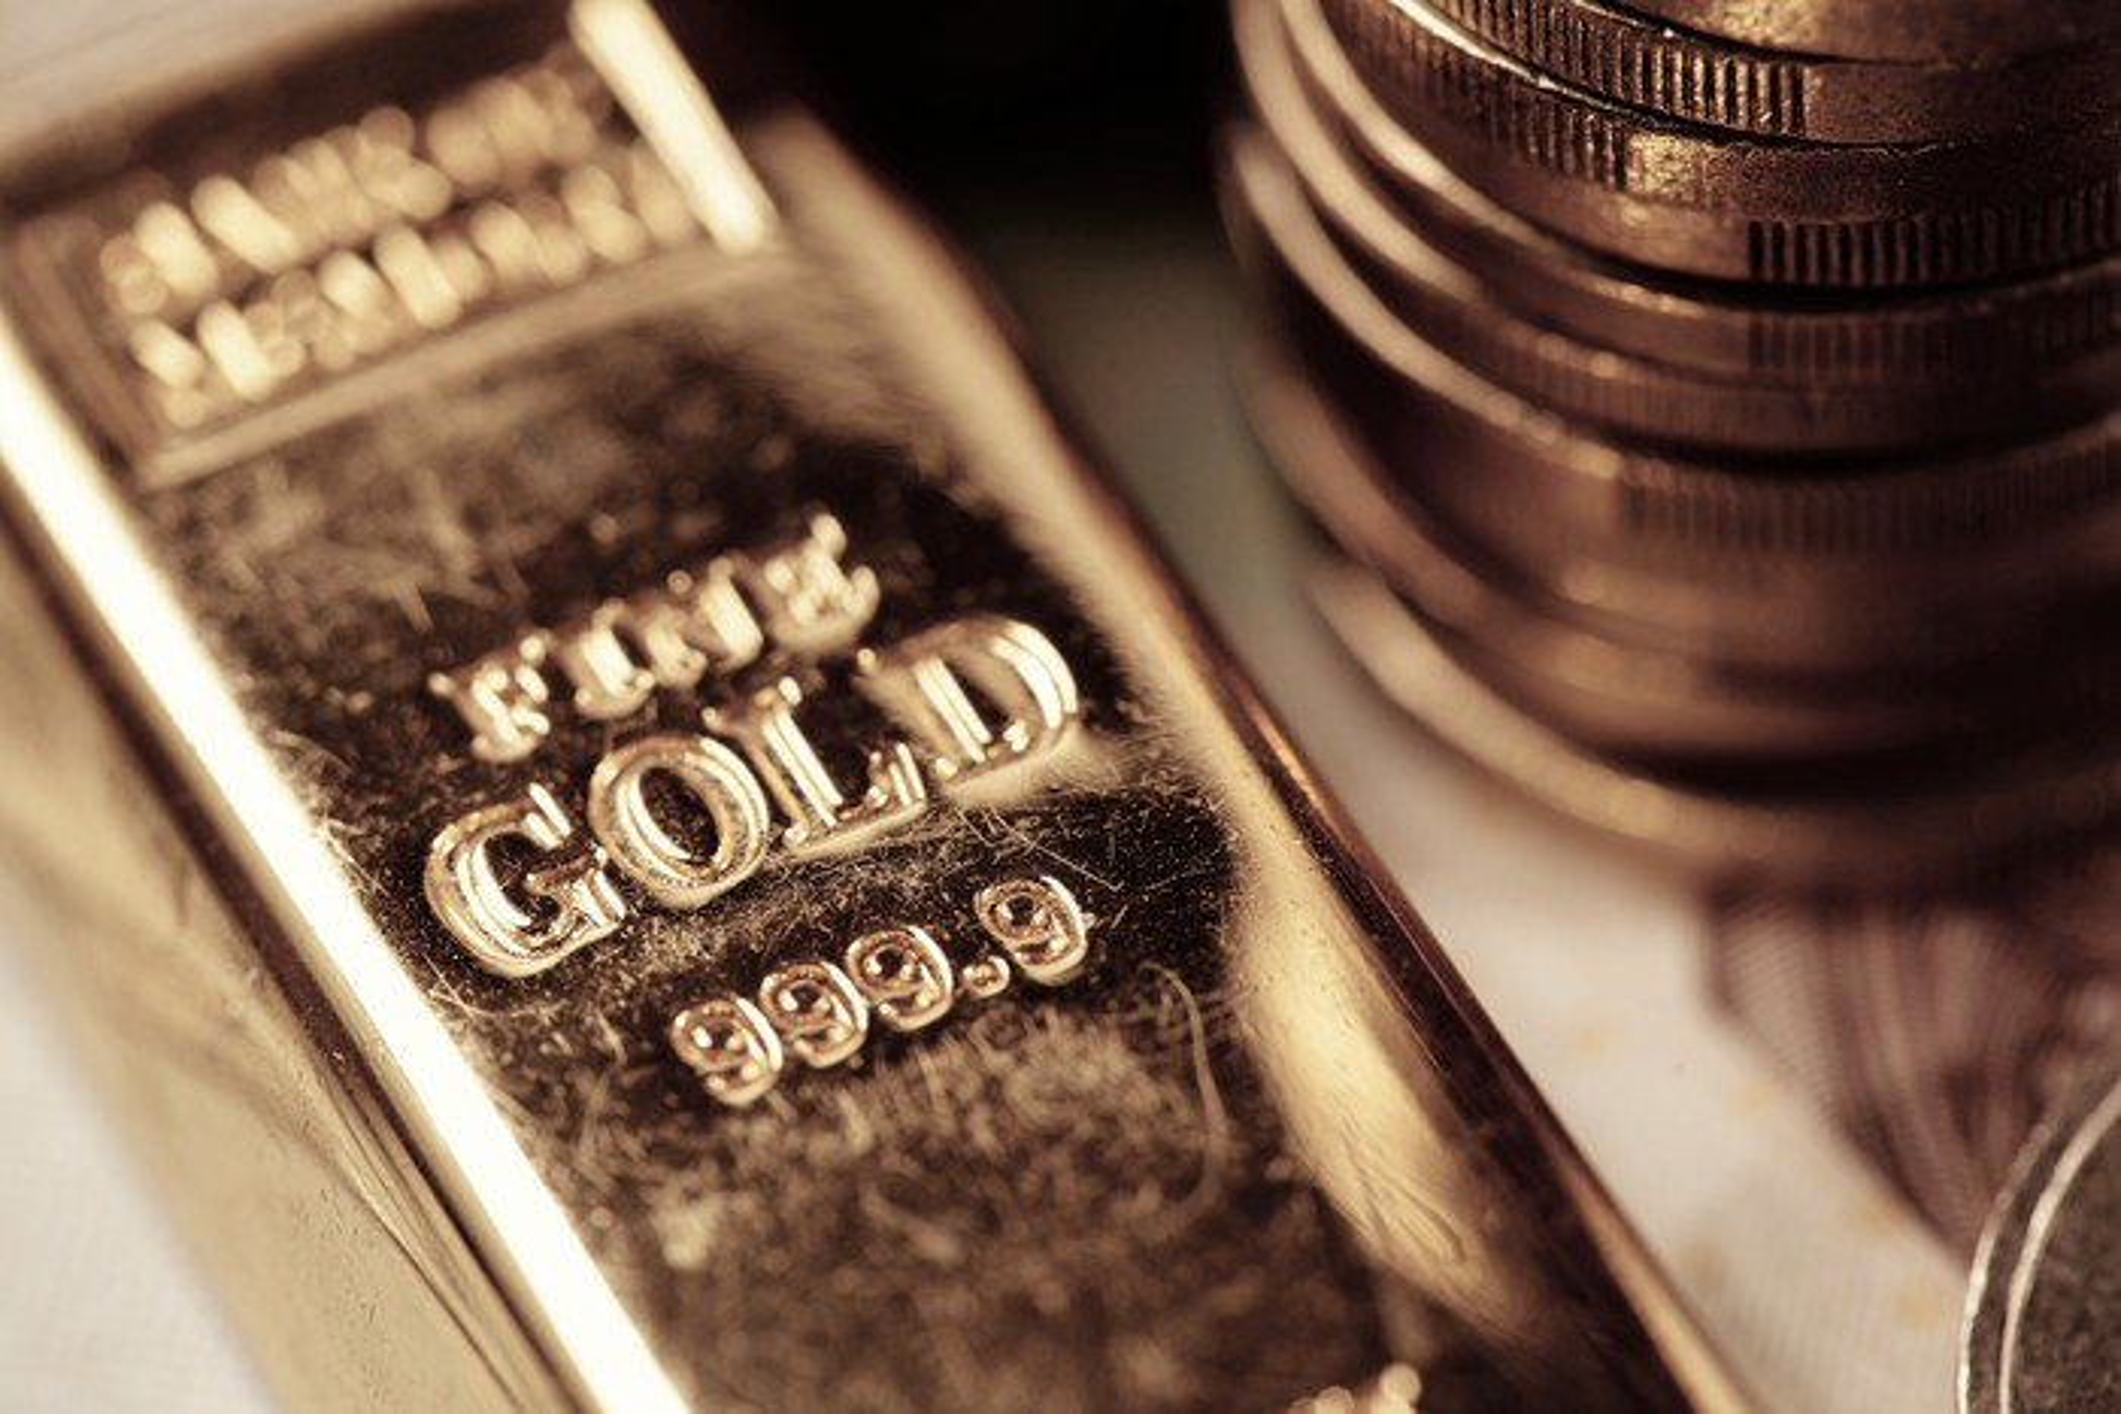 A gold bar lies next to a stack of gold coins.